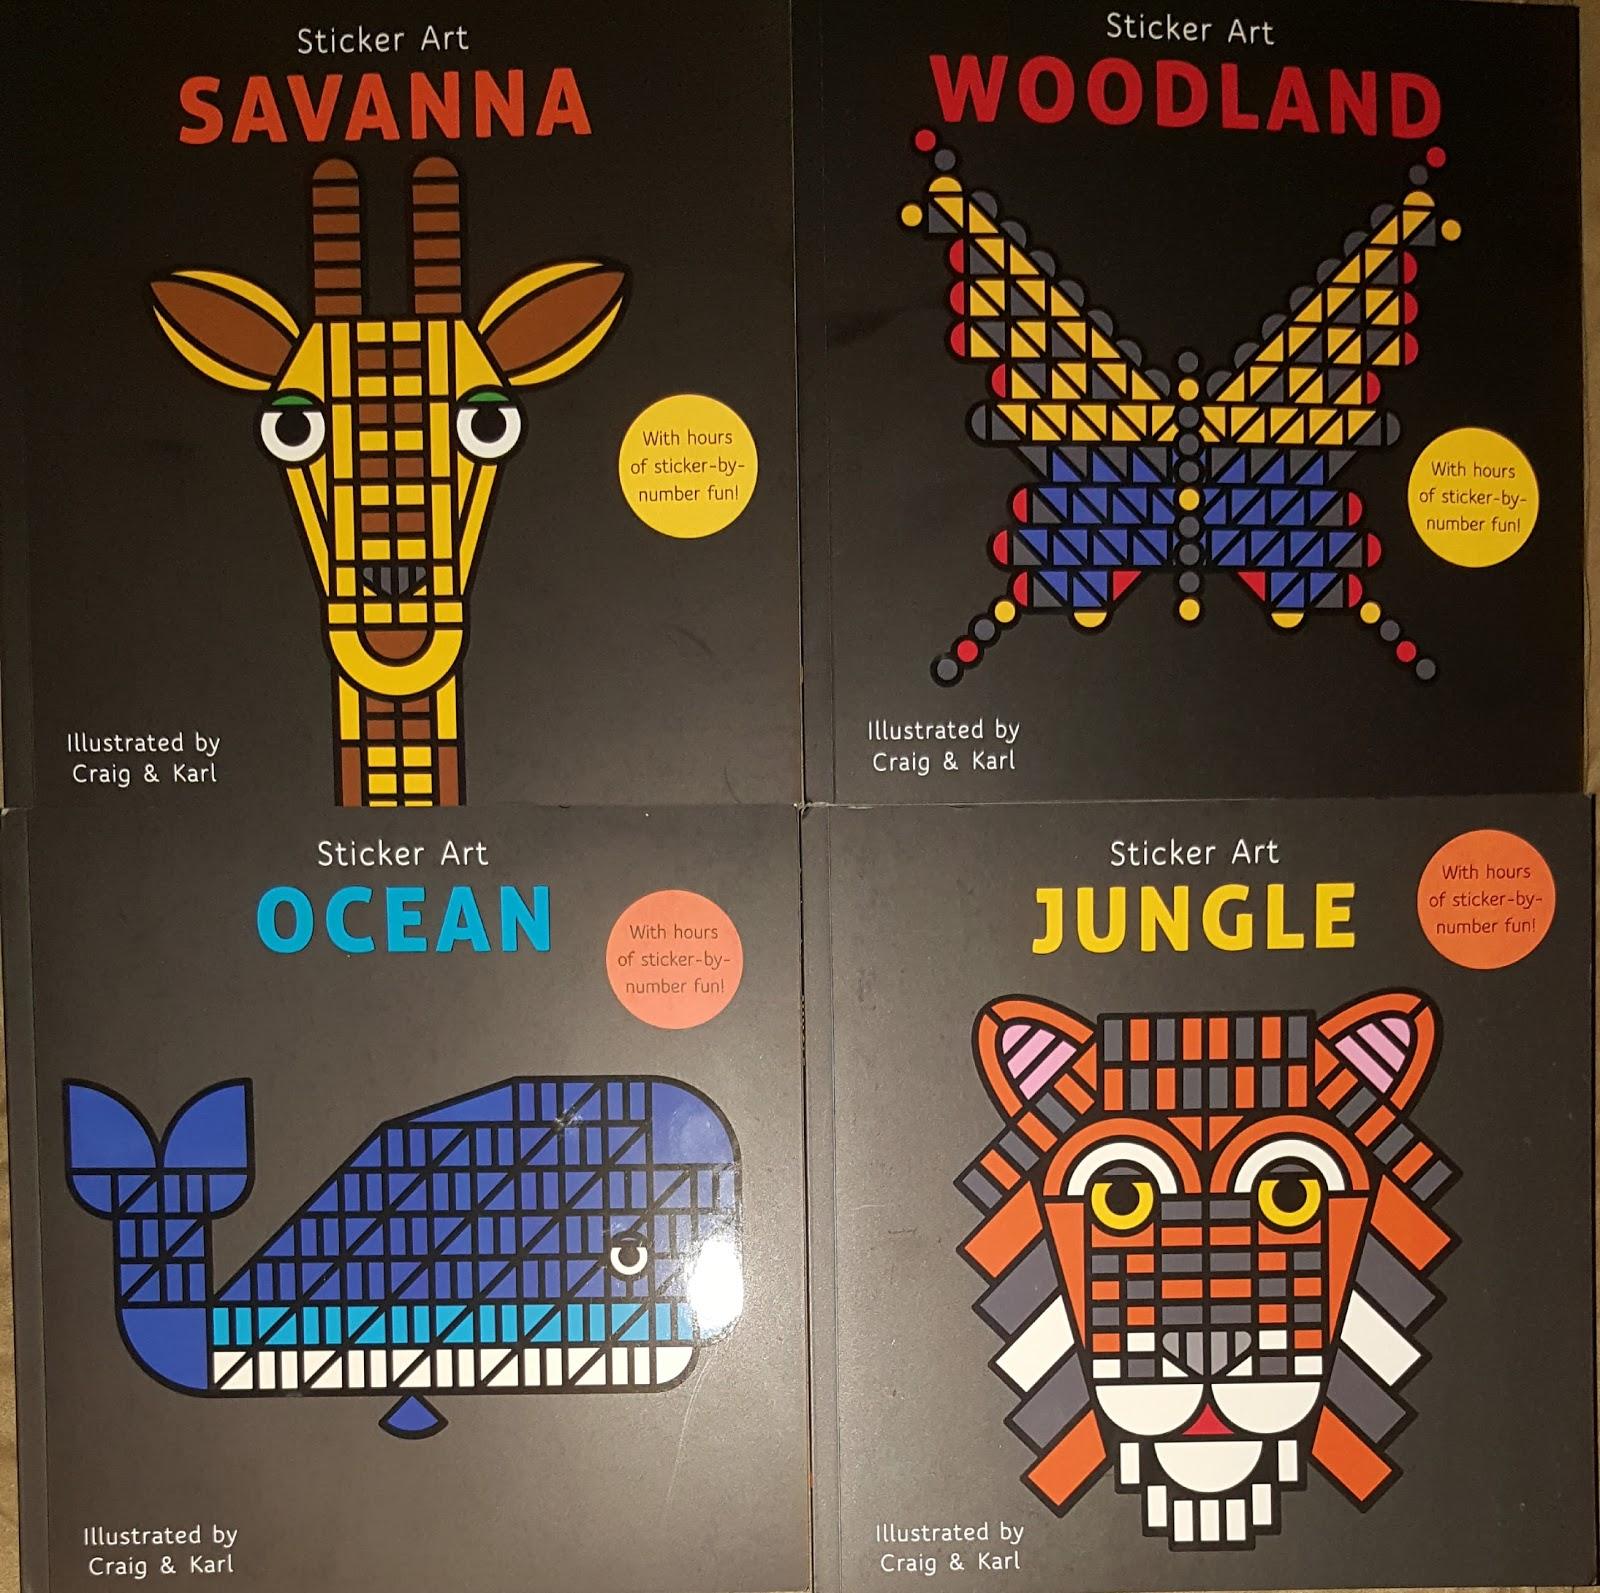 Sticker Art Books Giveaway